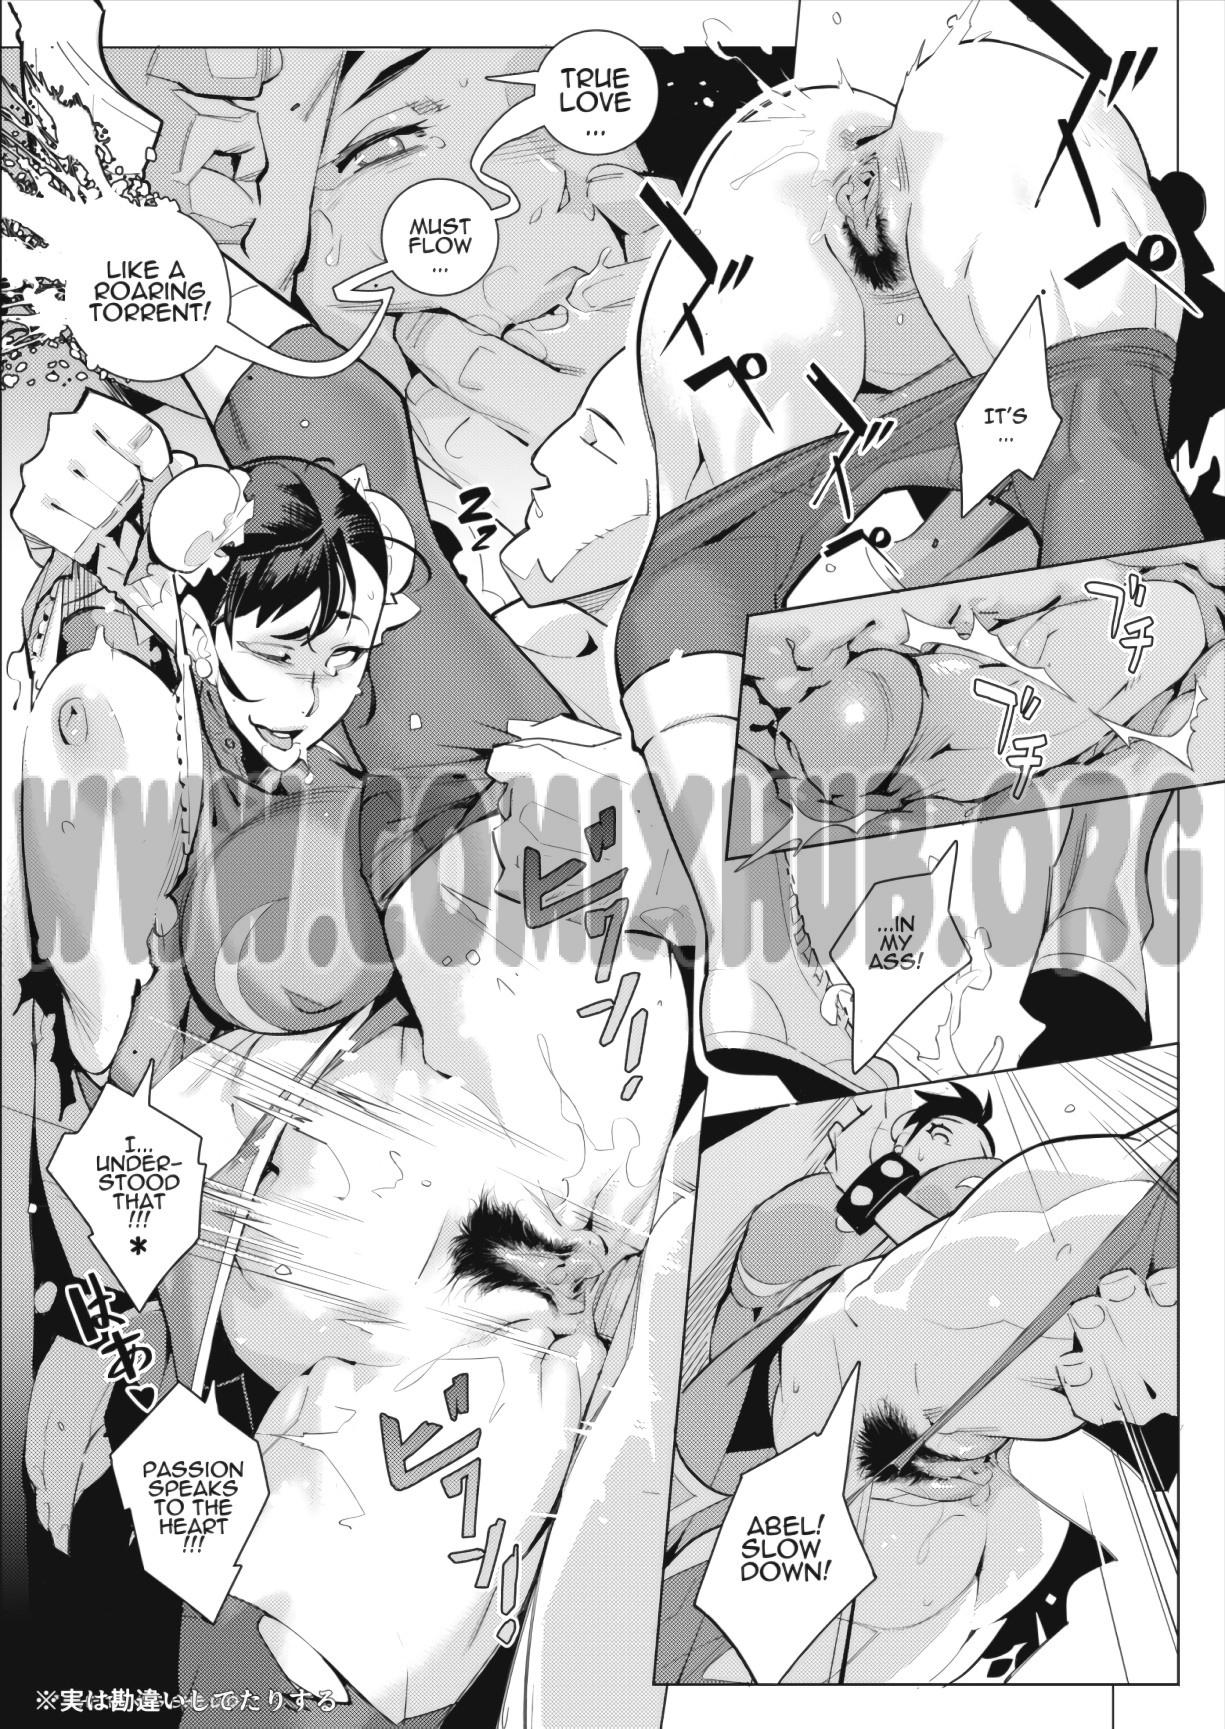 Straight to Anal - Chun-Li Short Doujin! sex comics Anal Sex, Big Tits, Creampie, fingering, X-Ray